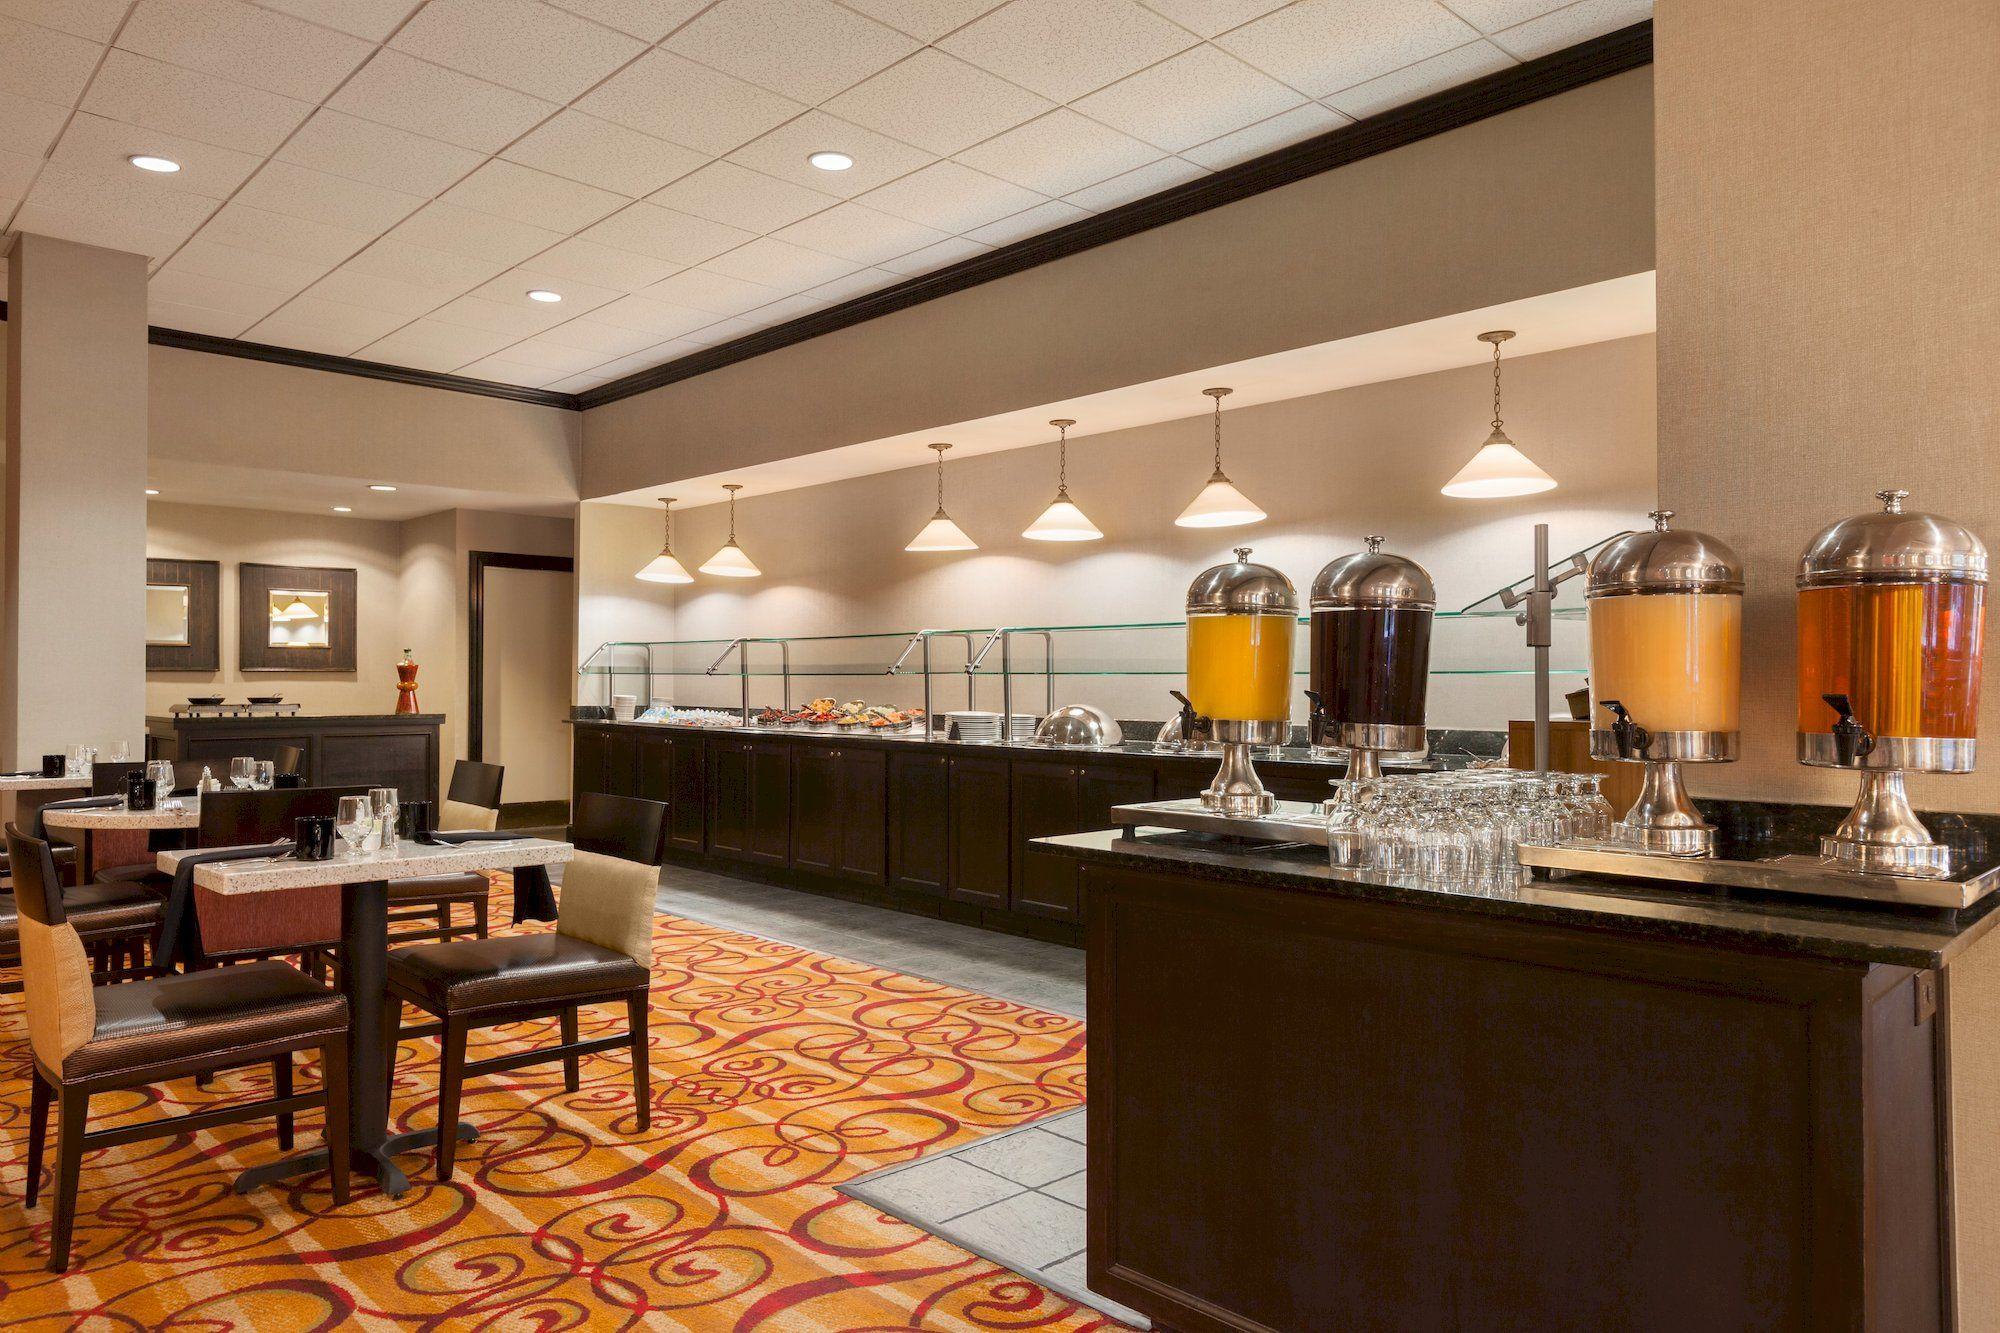 Hilton Fort Wayne at Grand Wayne Convention Center